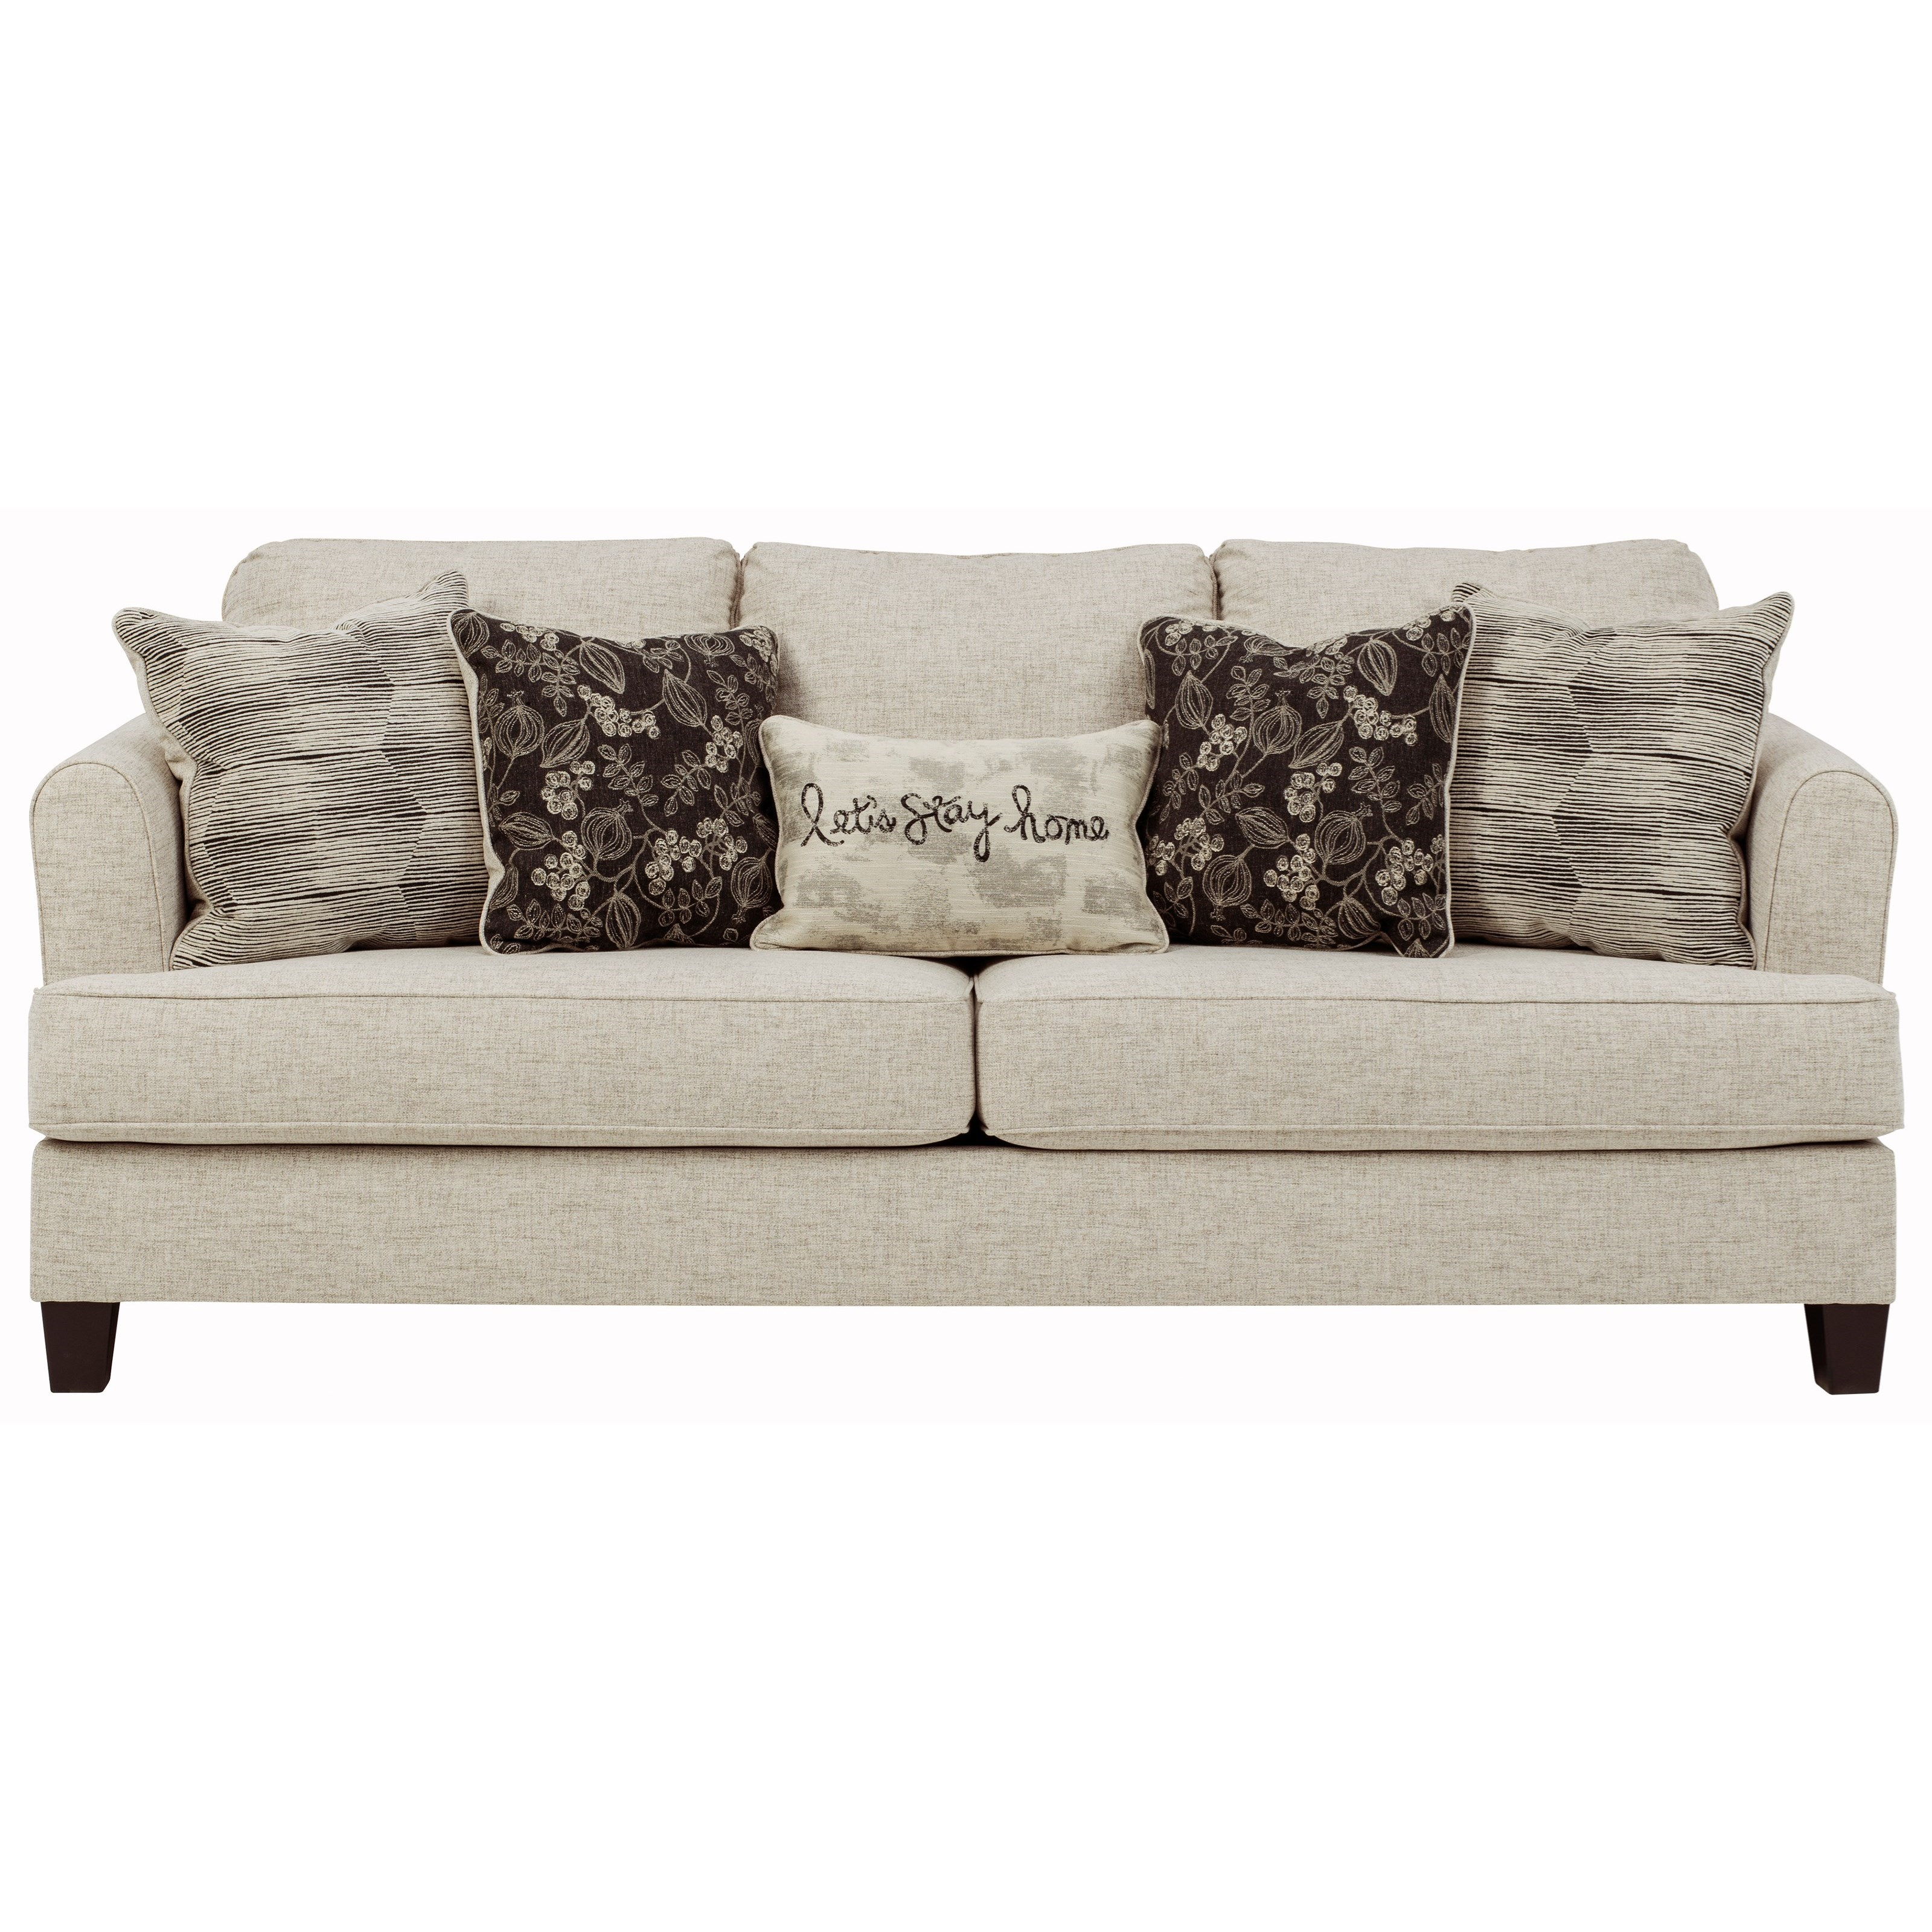 Callisburg Sofa by Benchcraft at Walker's Furniture